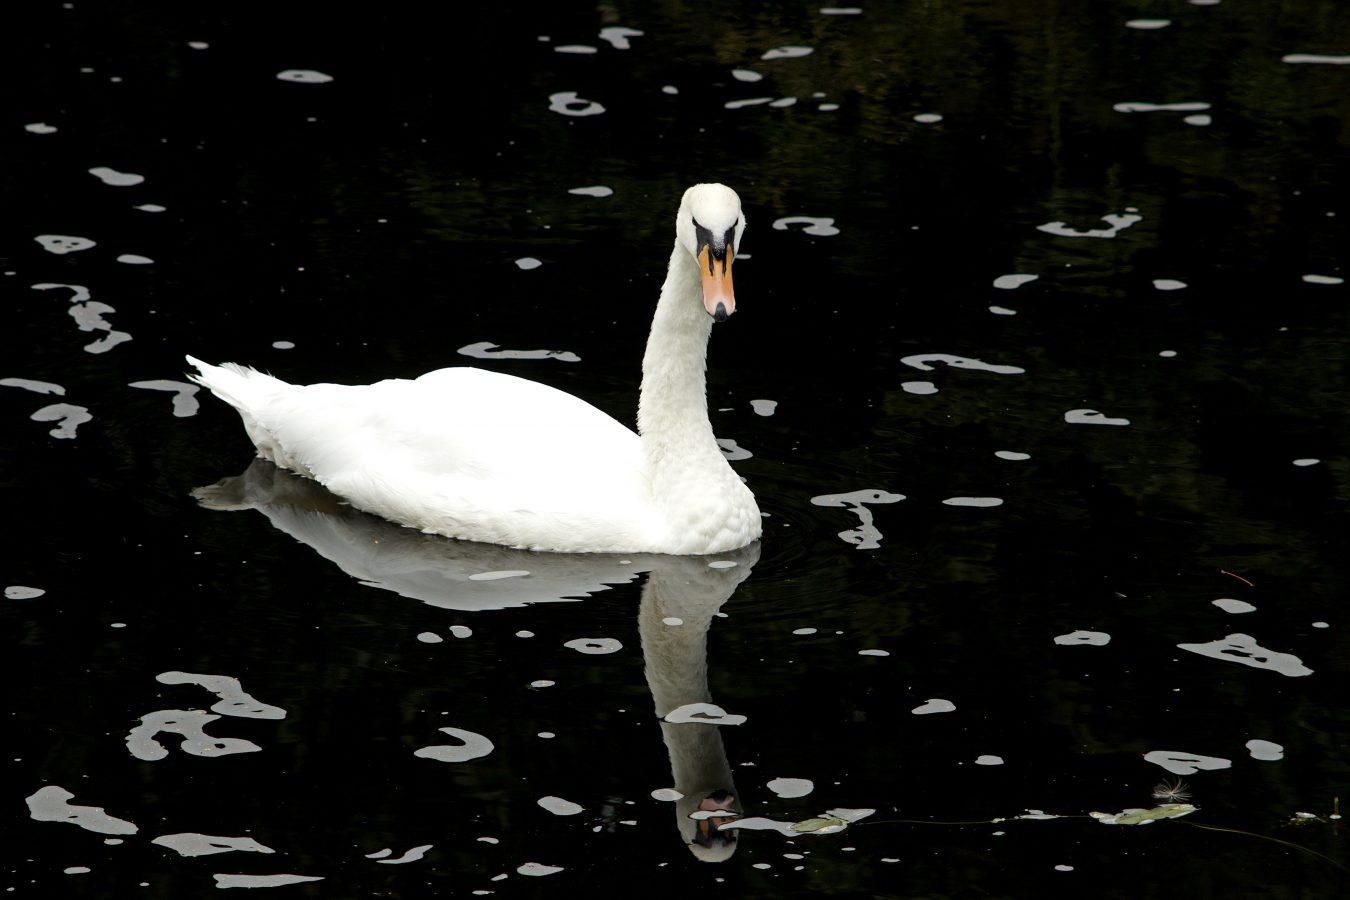 whiteswanblackwater